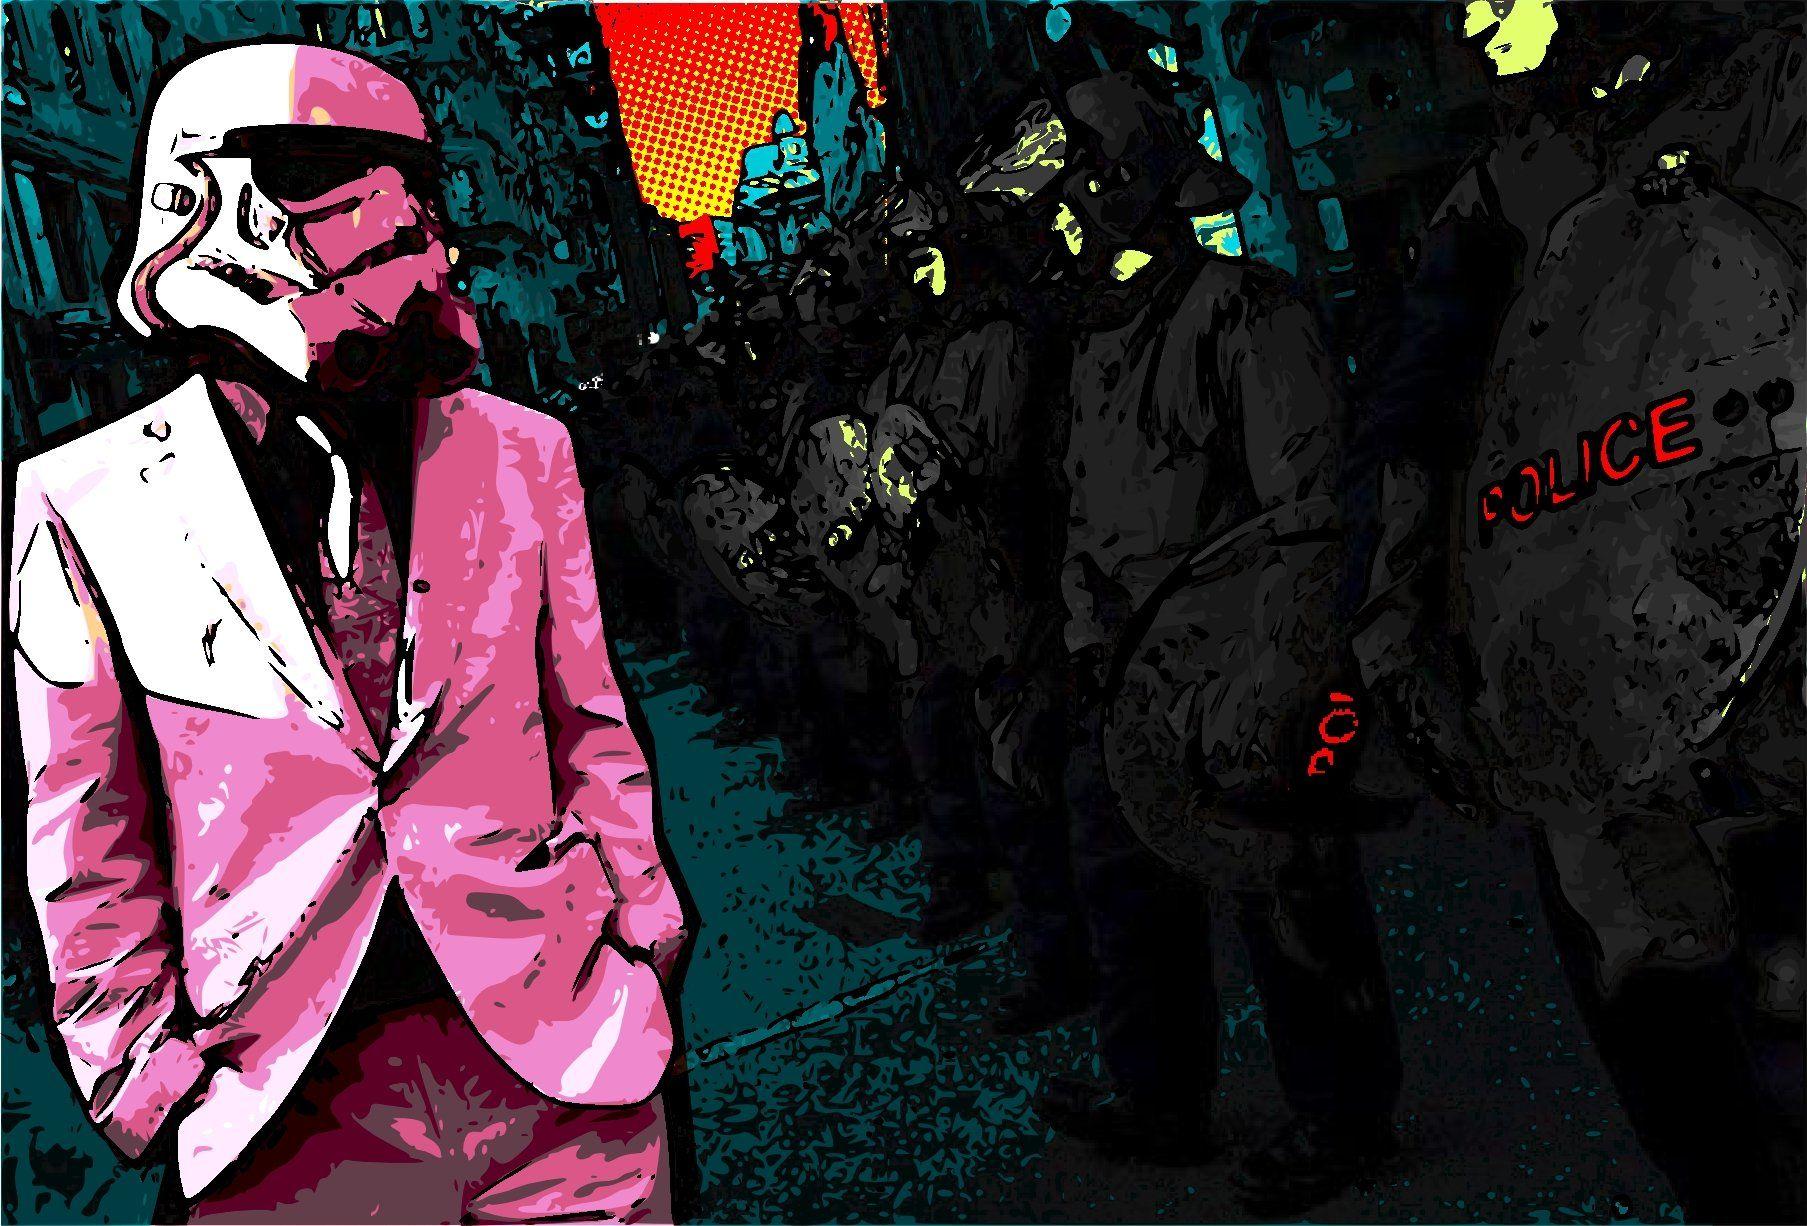 Cm Punk Wallpaper Wwe Champion Stormtrooper Wearing A Suit